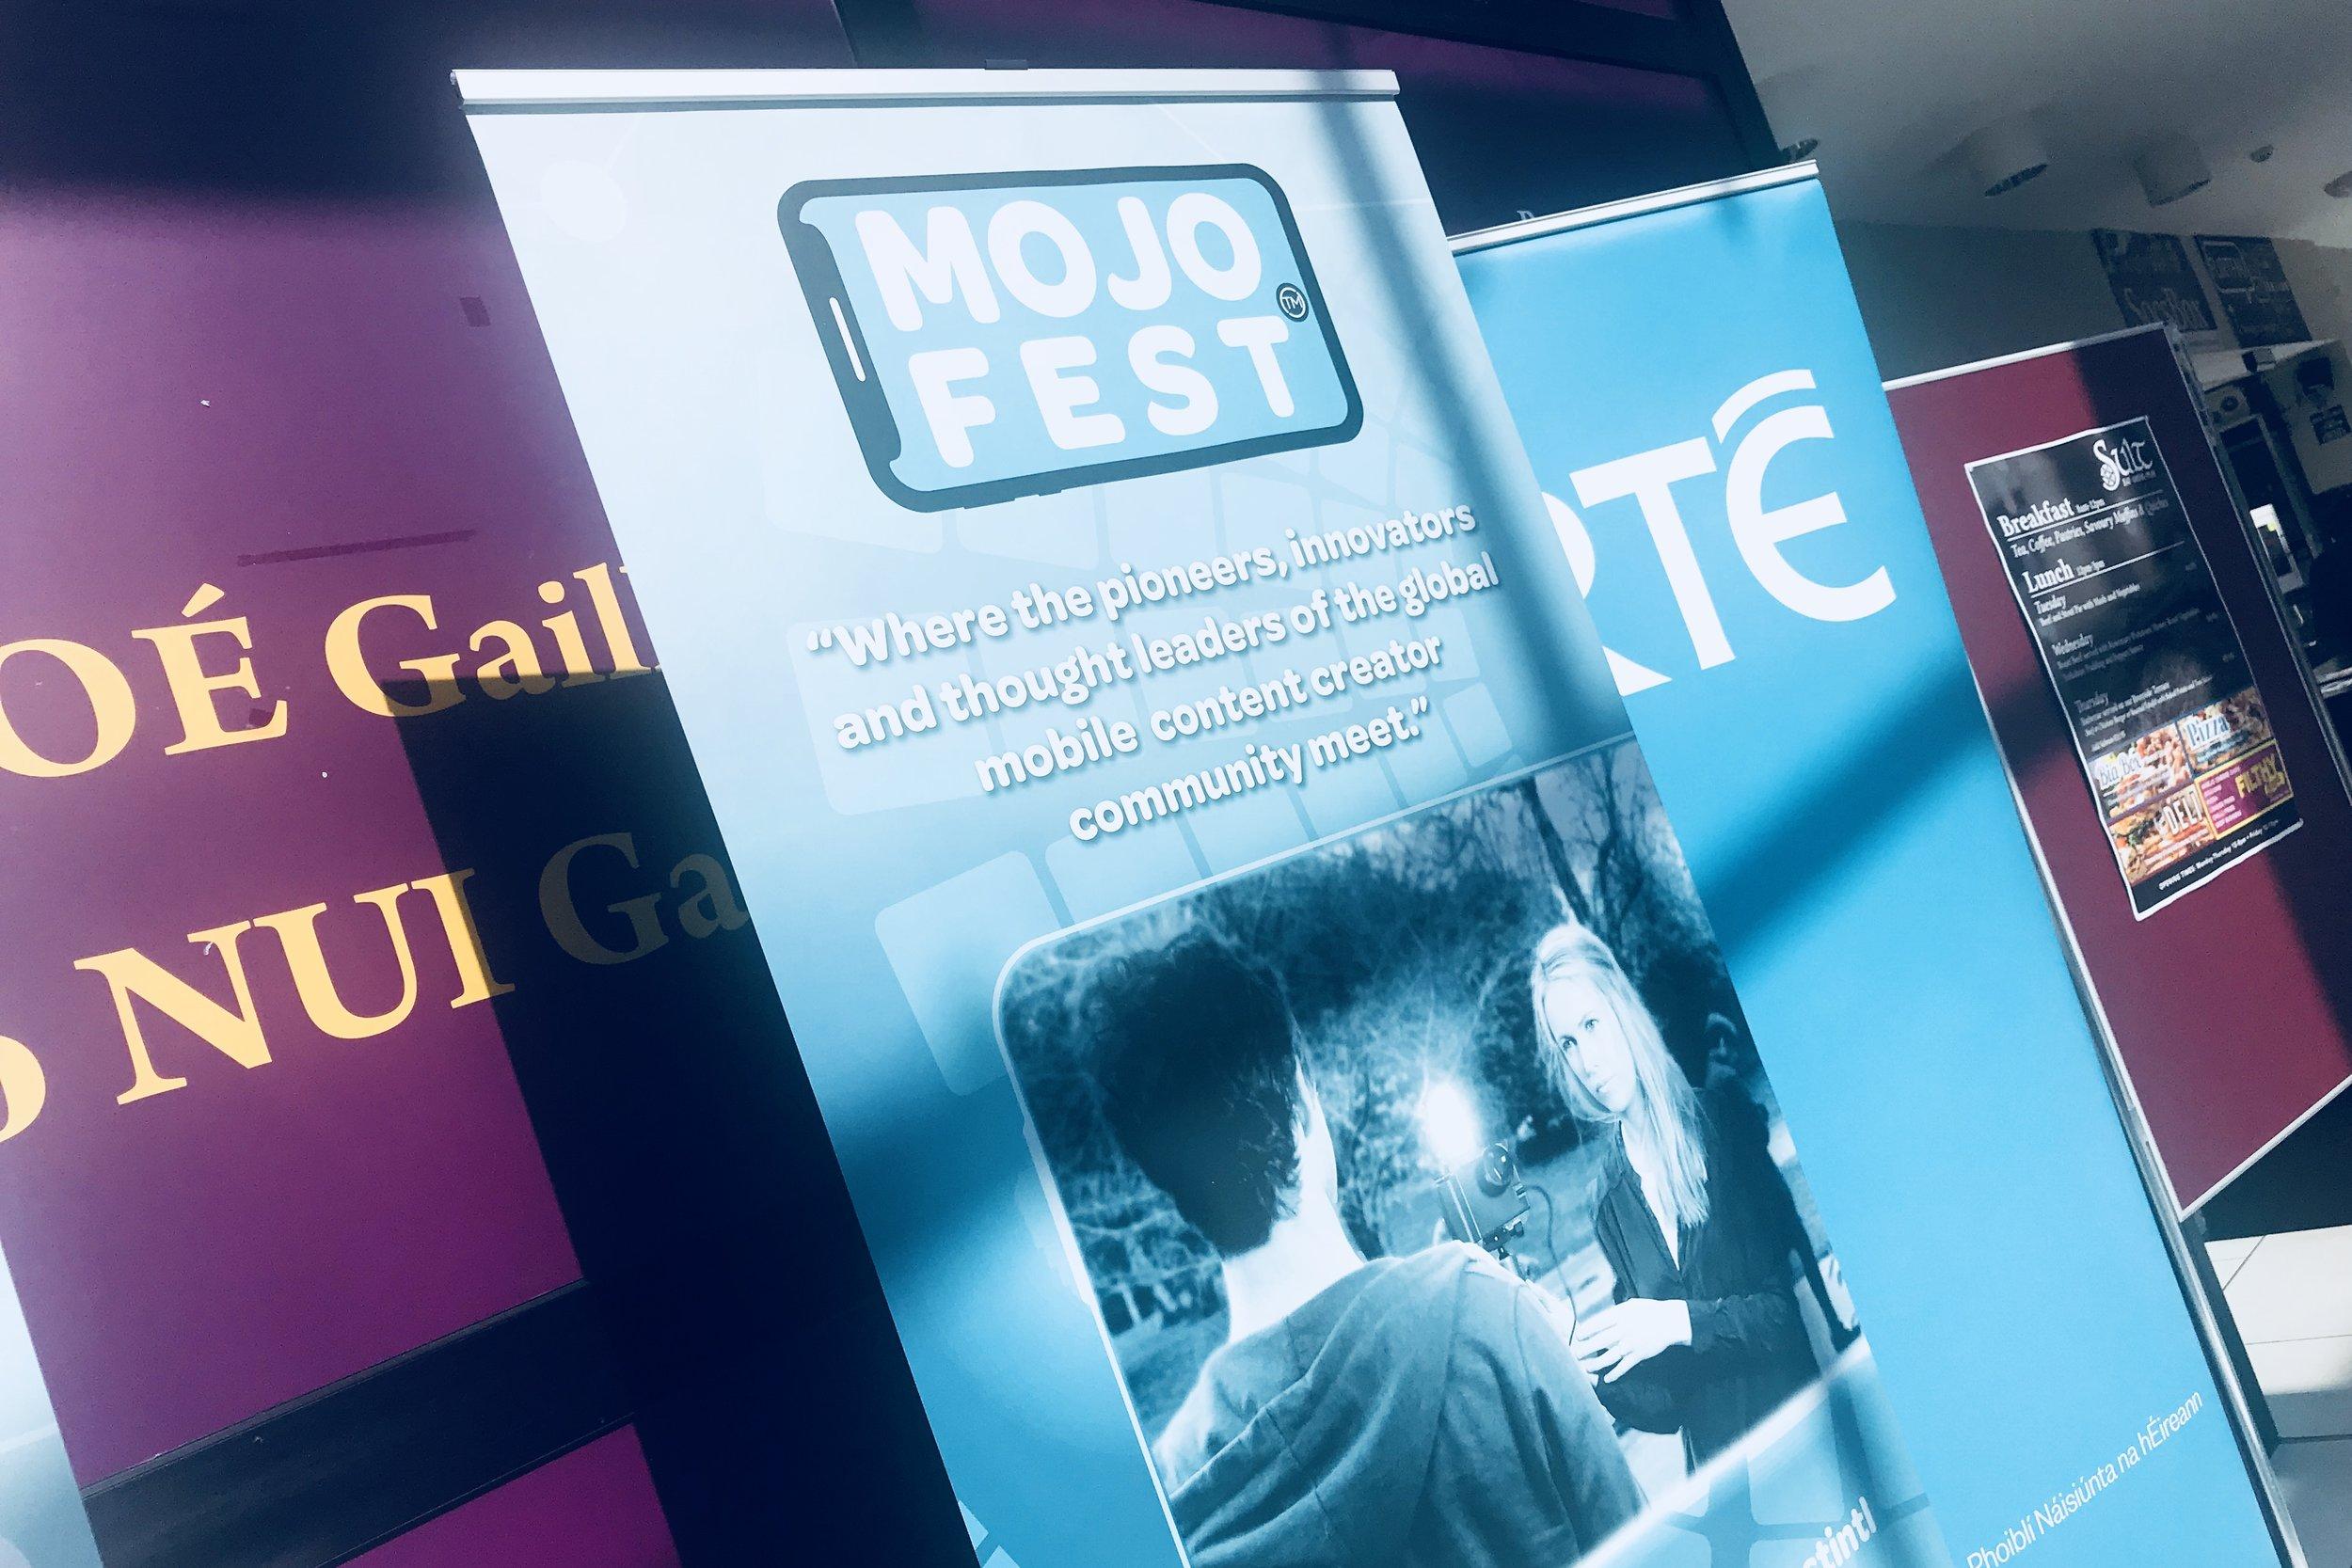 davidsonrodrigues_smartphonevideocoach_mojofest_galway_blog_3.jpg